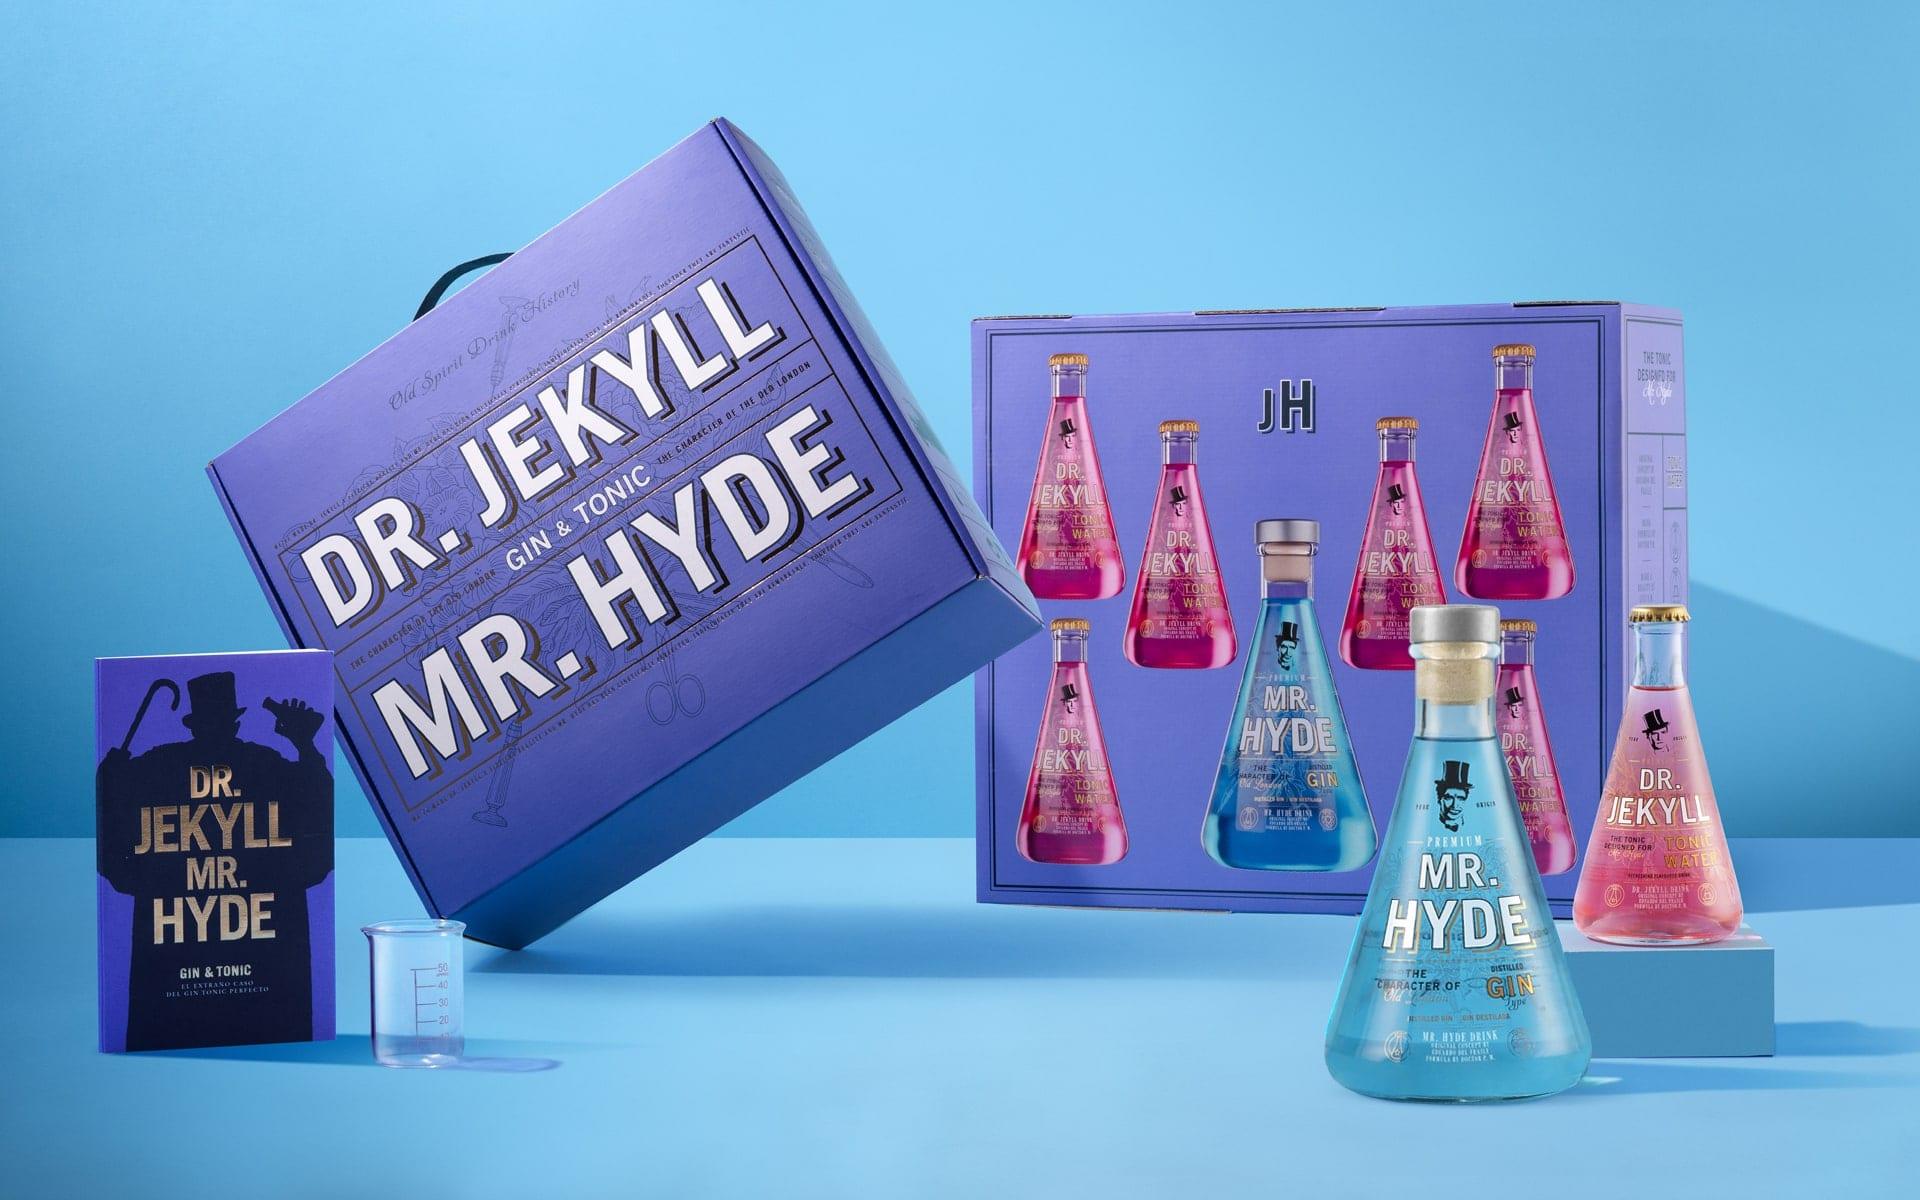 Maletín de Dr. Jekyll y Mr. Hyde